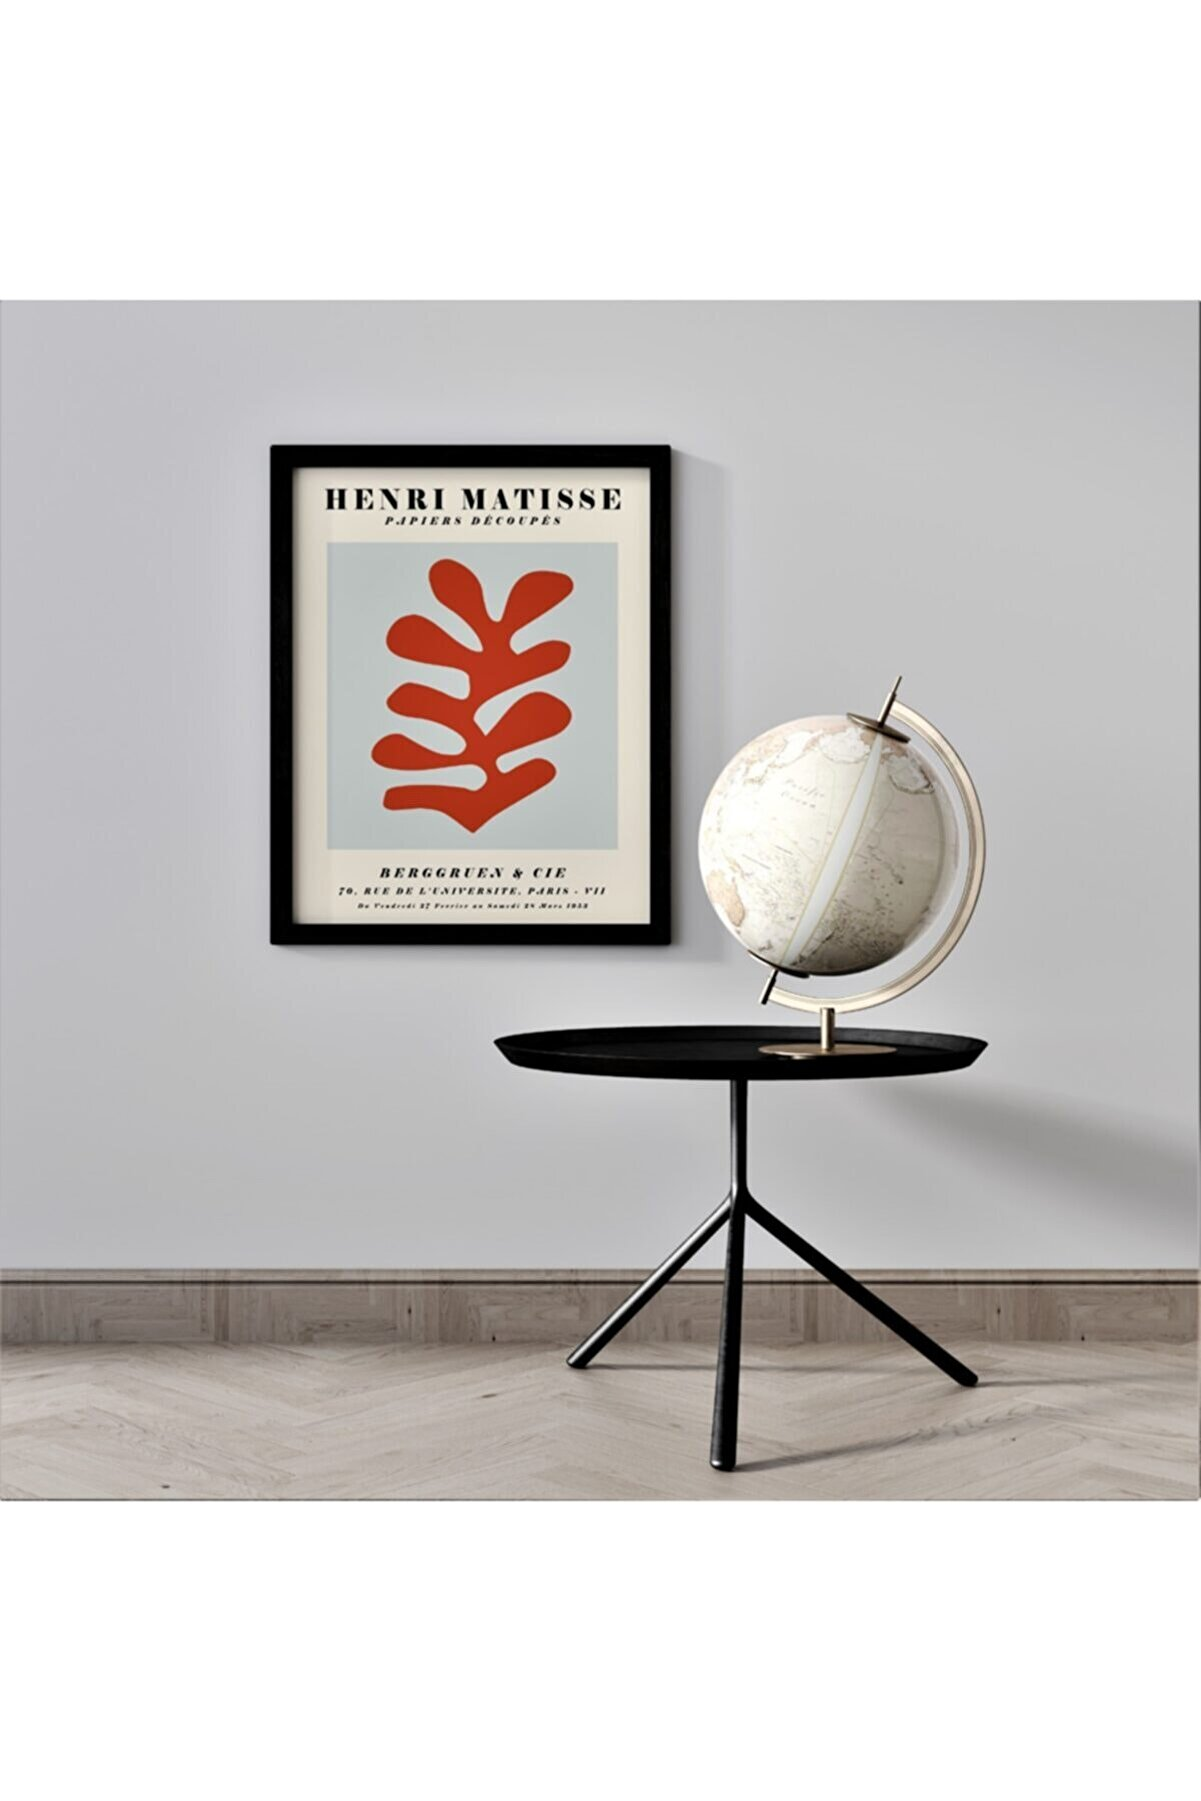 KONSEPT ART Henri Matisse 'papiers Decoupes' Paris Mdf Çerçeveli Modern Ahşap Tablo